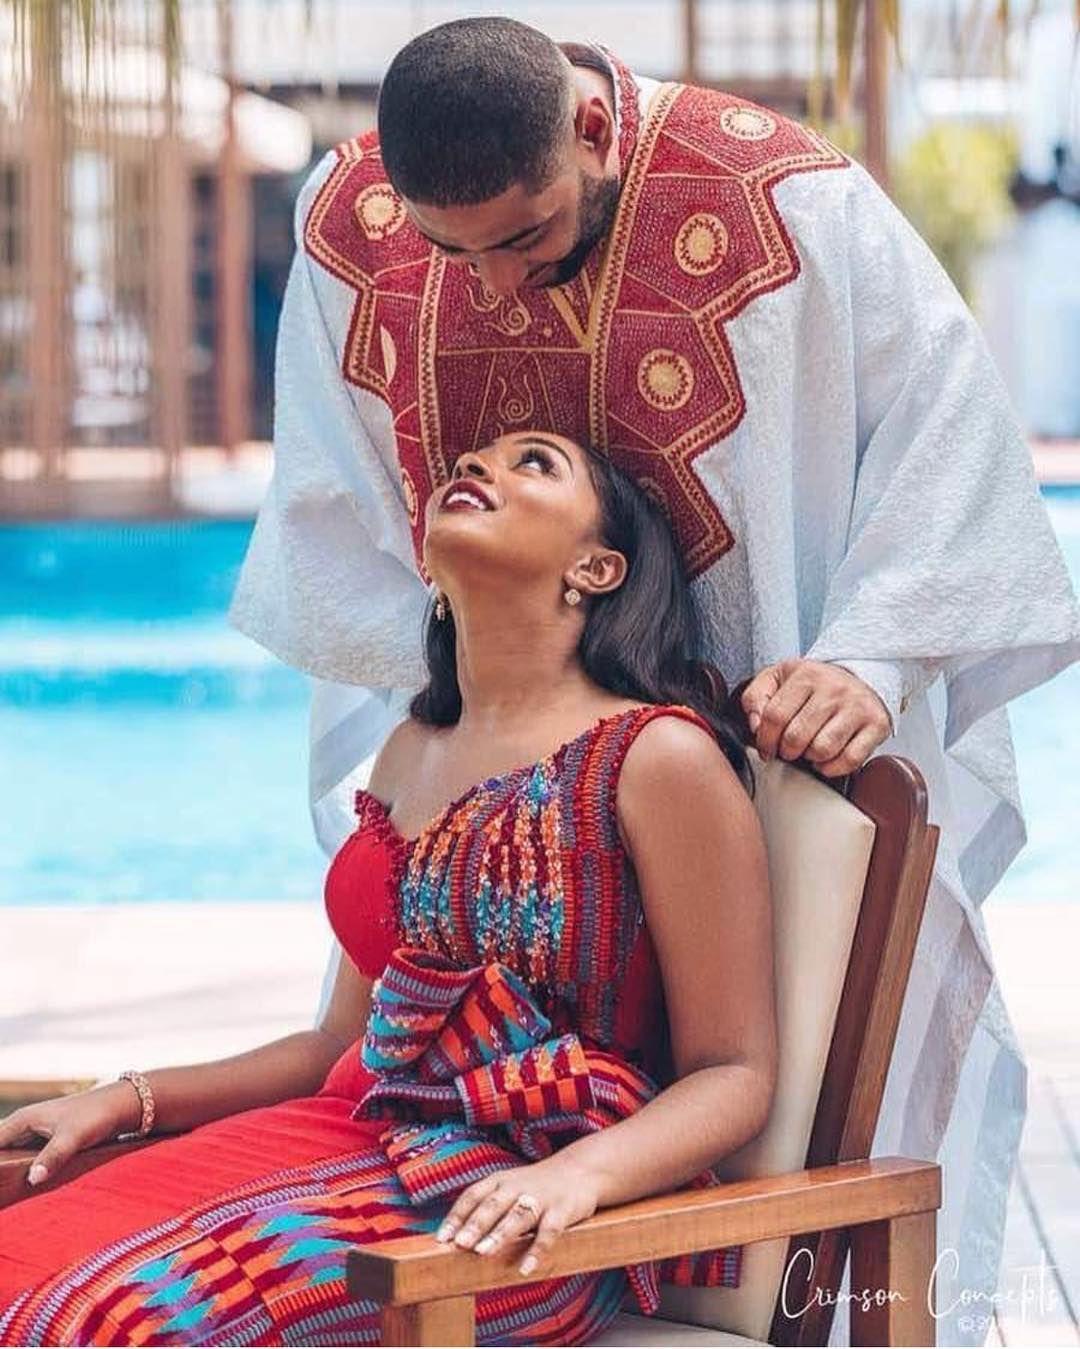 Hen I Look Into Her Eyes Congratulations To Joel And Anisha Joelandanisha18 Kingdomroyalwedding Stylecapitalwedding African Attire Kente Congrats